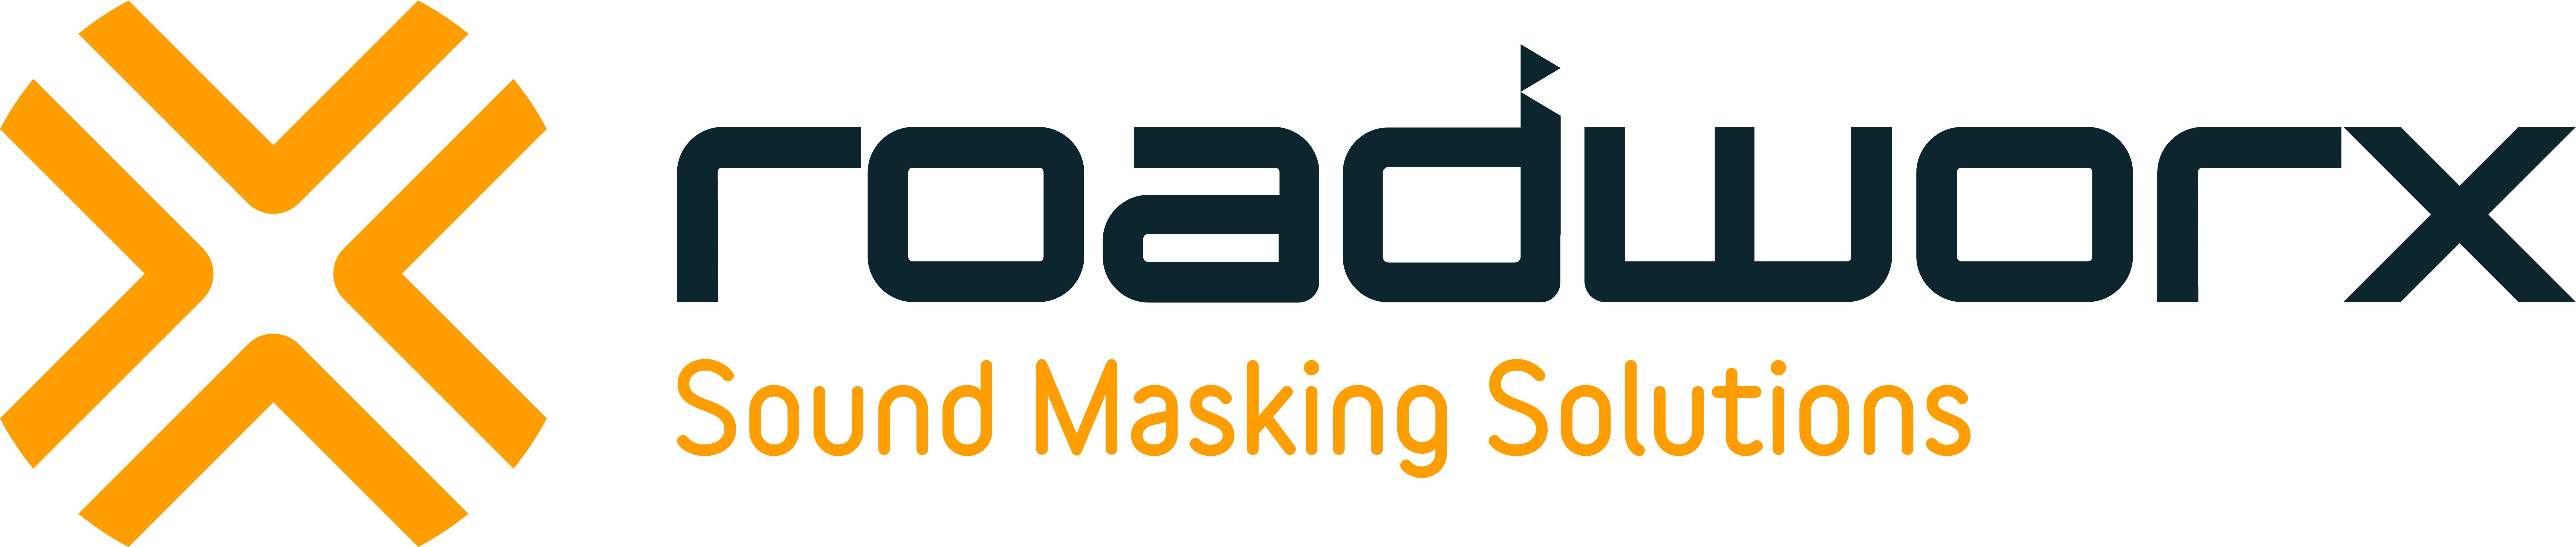 Roadworx Sound Masking